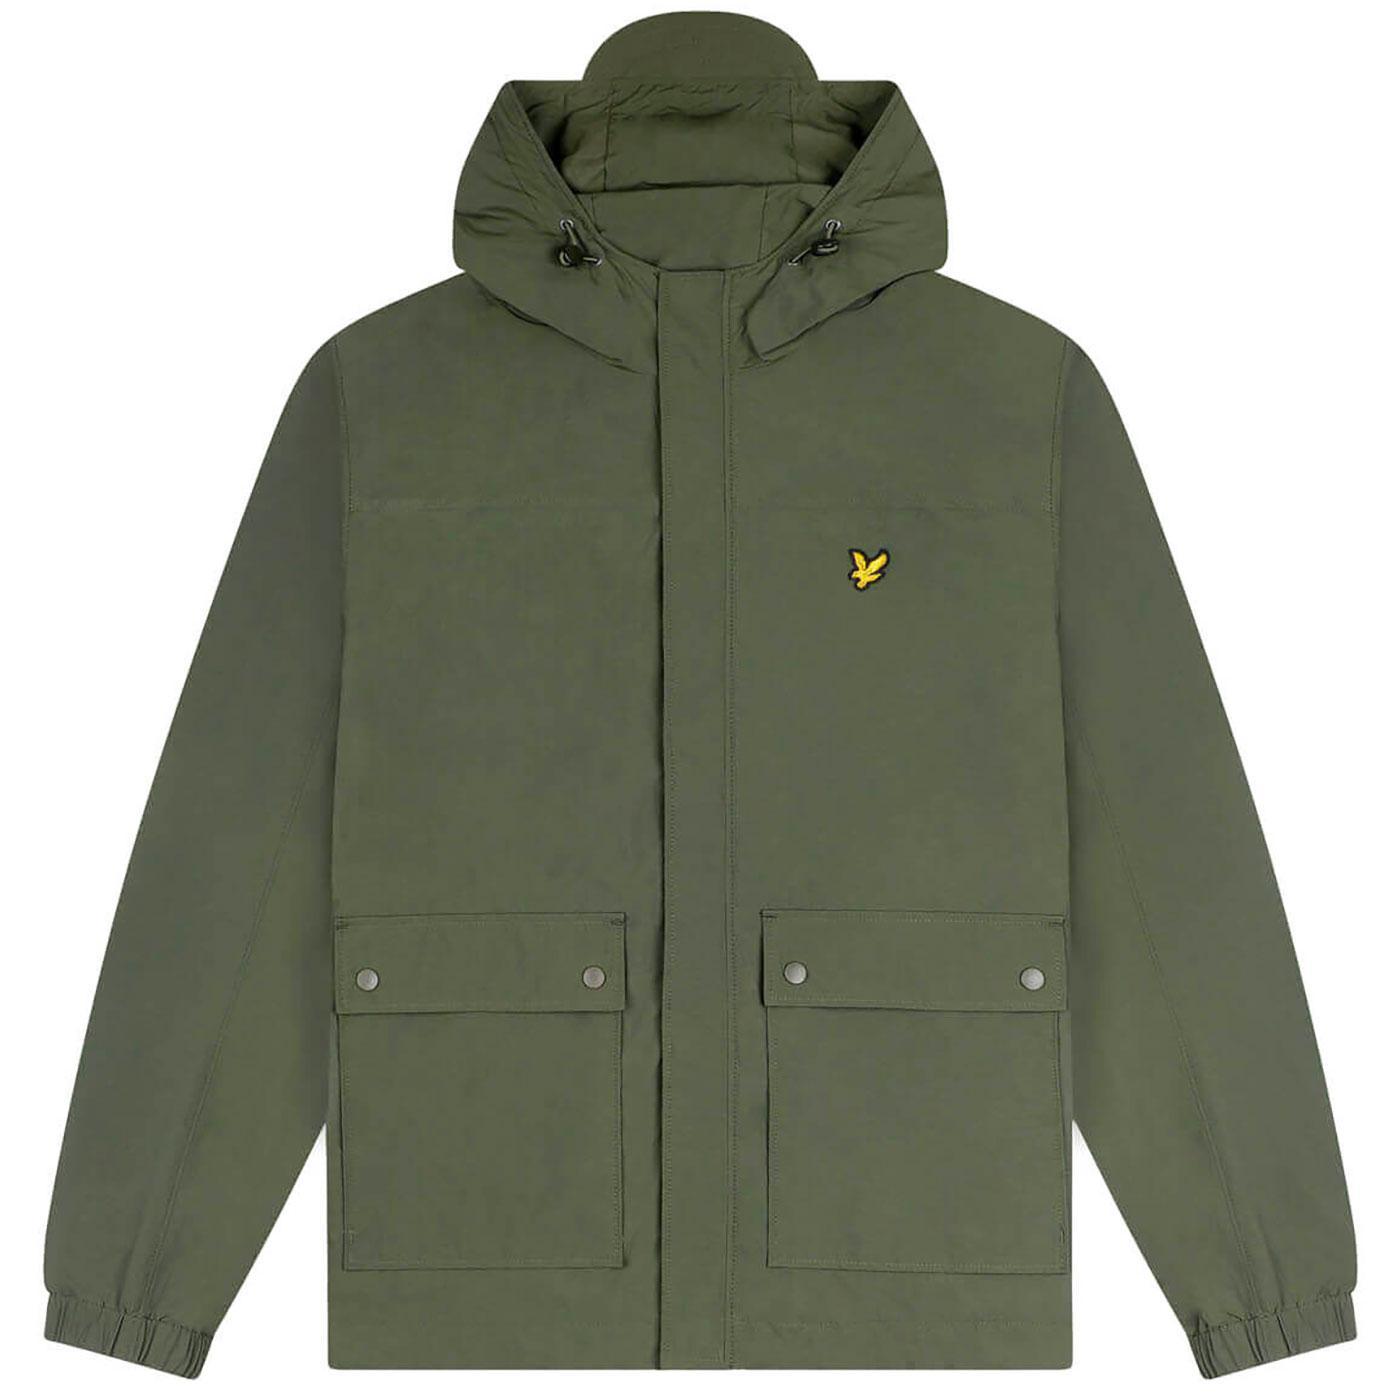 LYLE & SCOTT Men's Retro Hooded Anorak Jacket TG